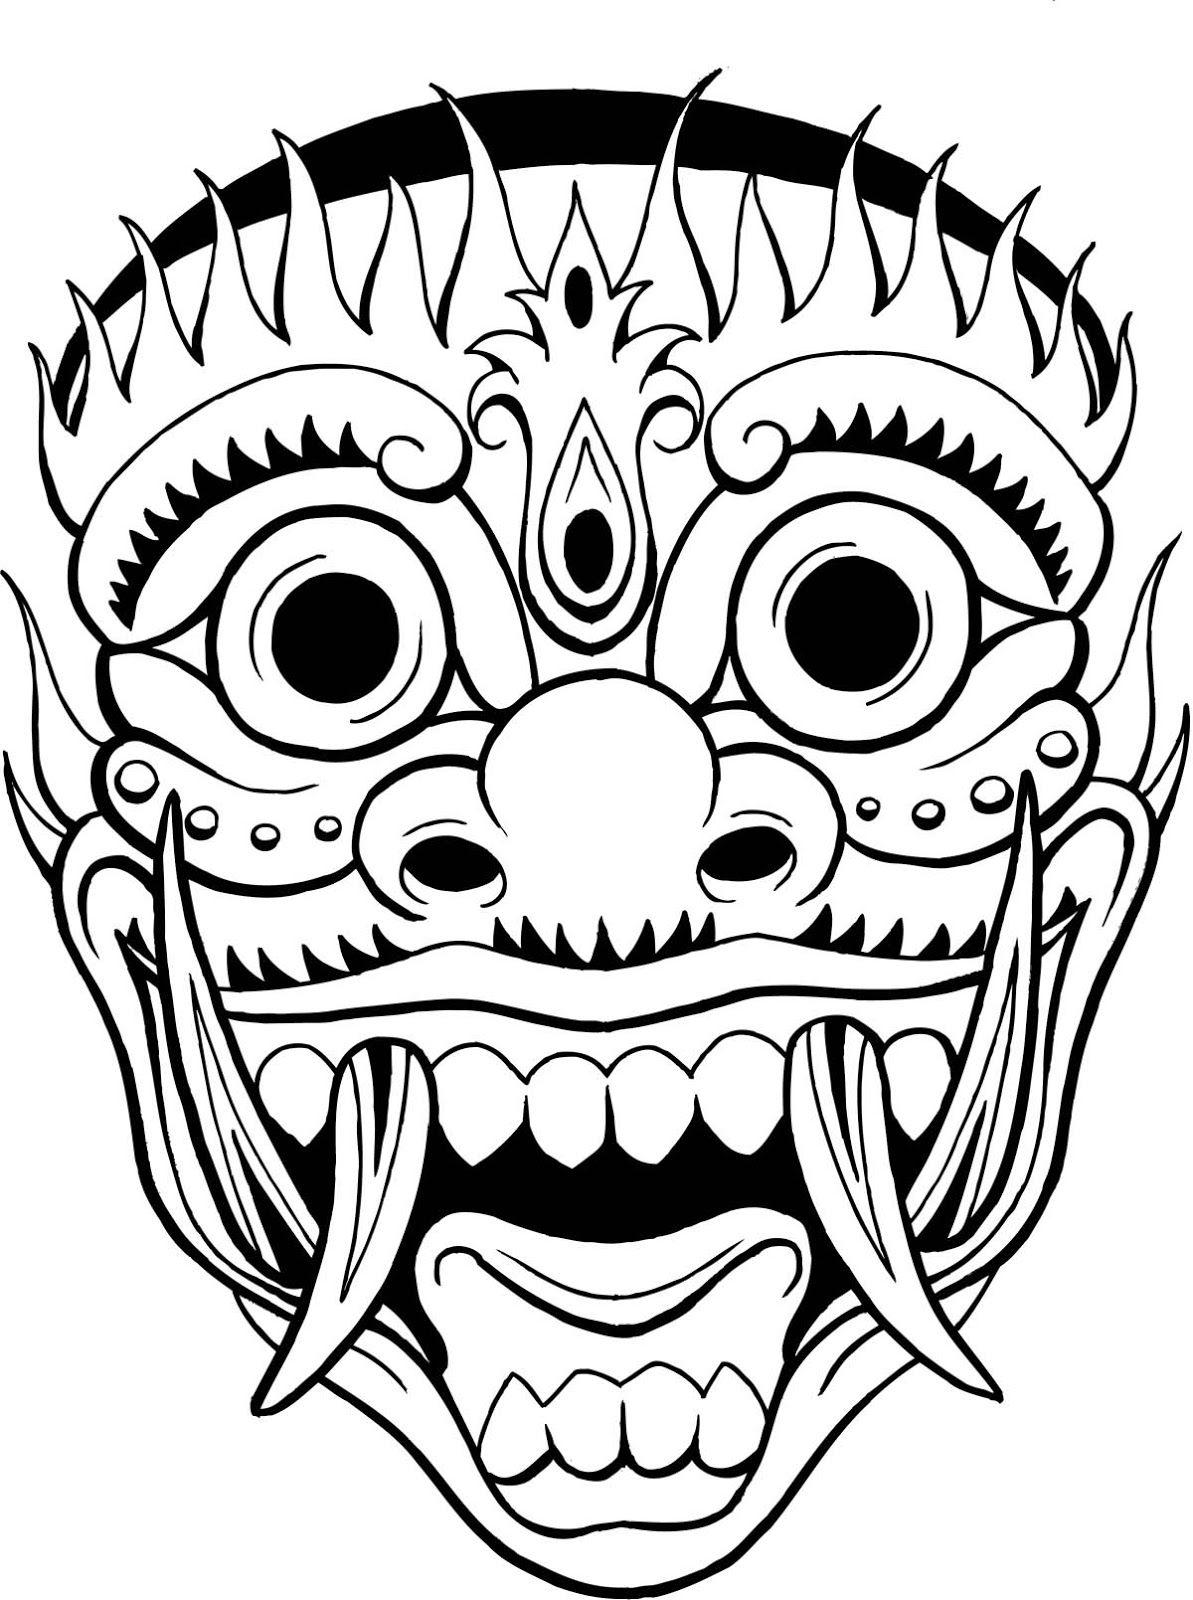 Hawaiian Warrior mask - Google 검색 | culture mask | Pinterest ...